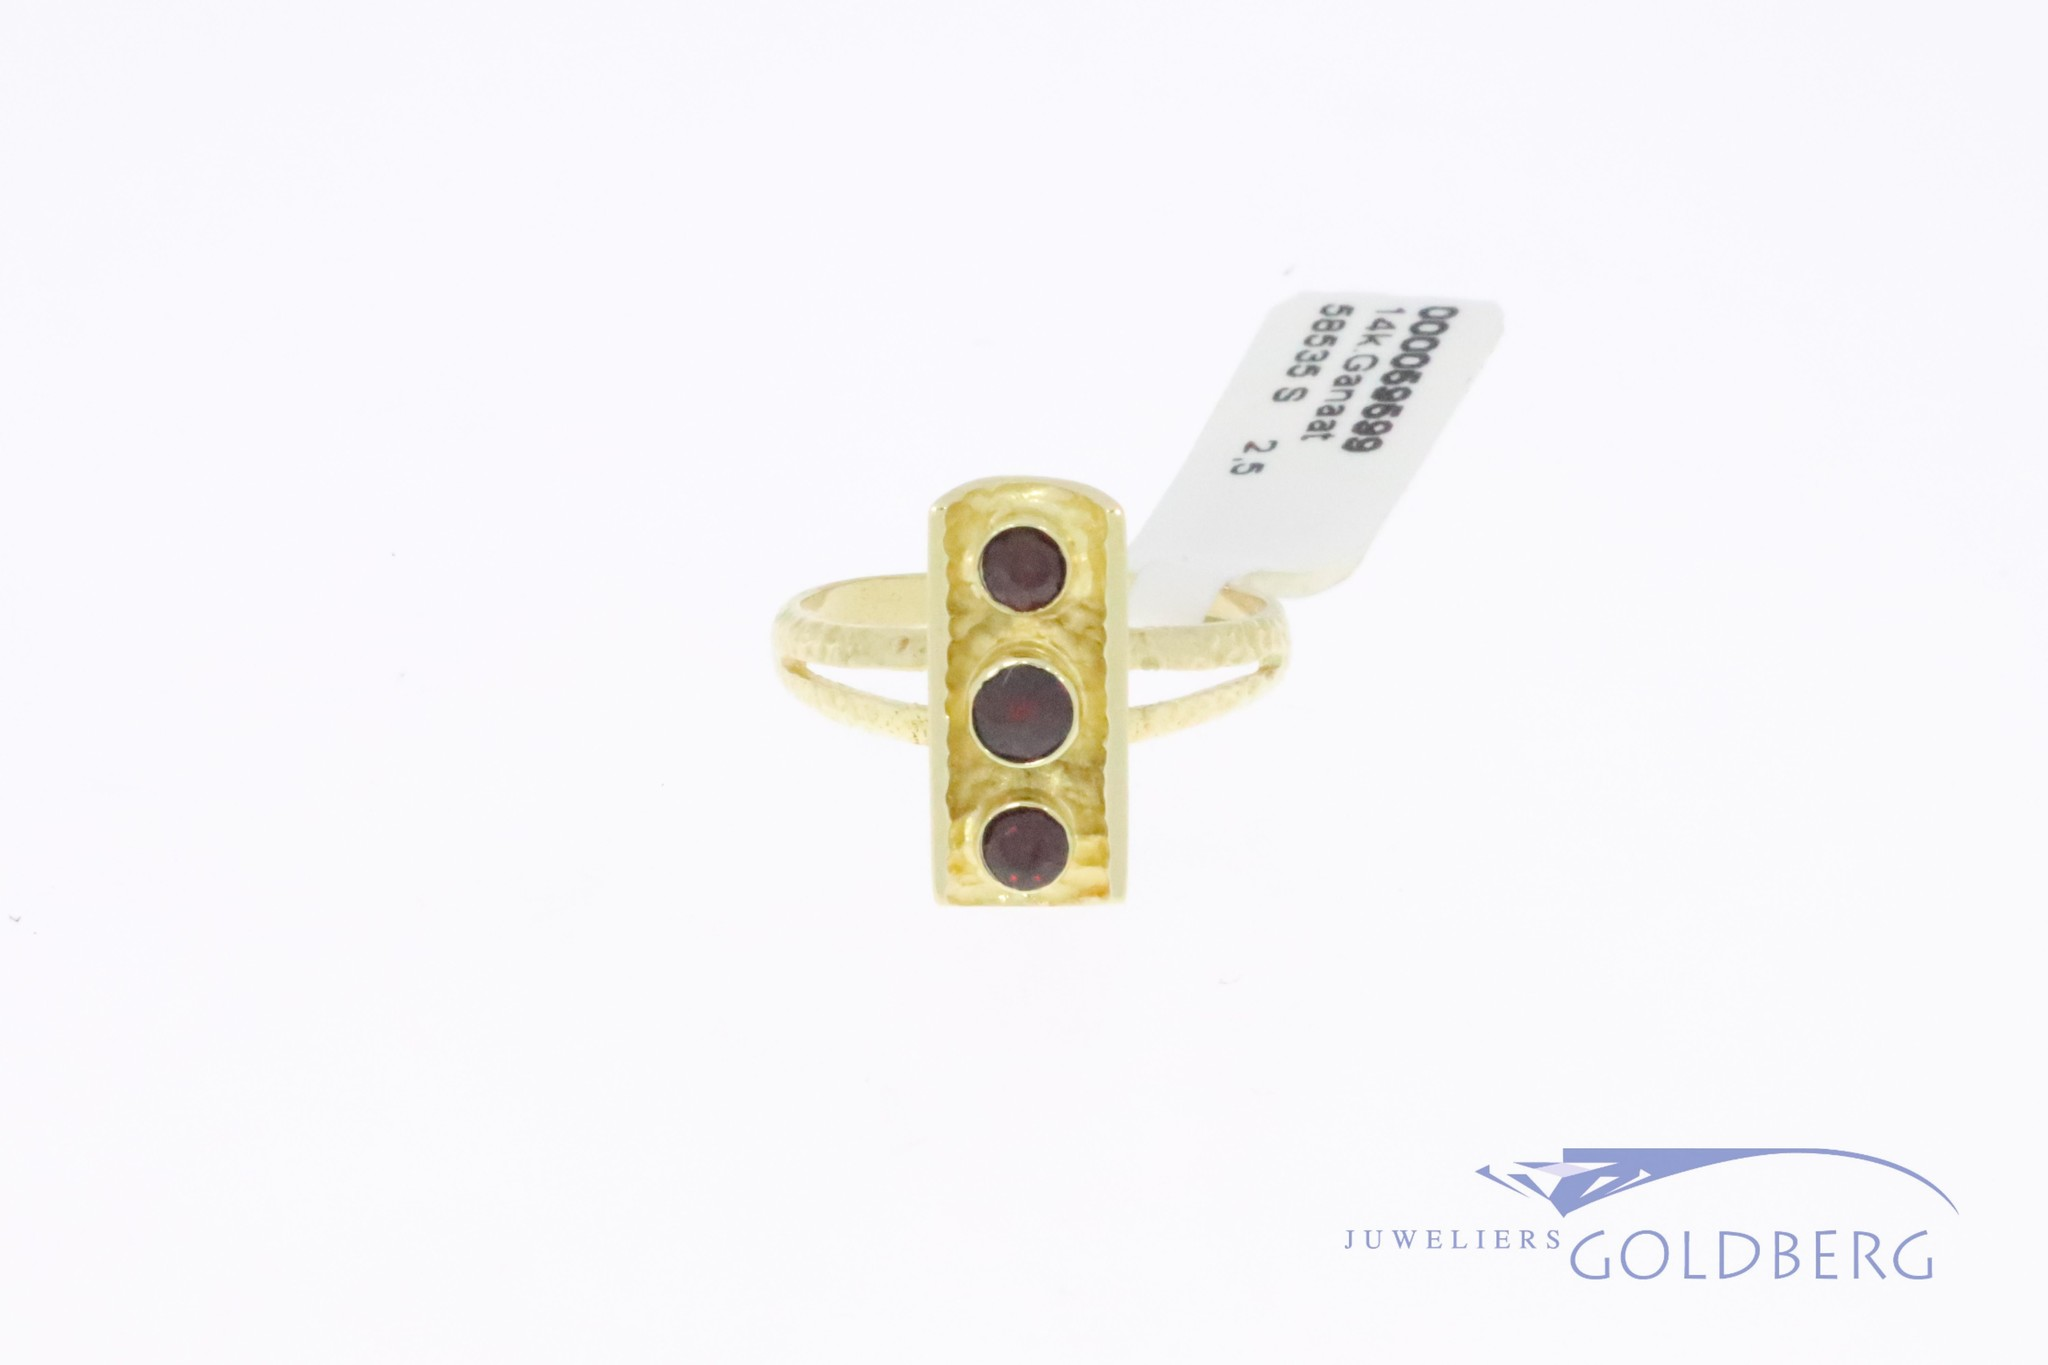 14k gouden vintage strakke design ring met 3 granaatjes